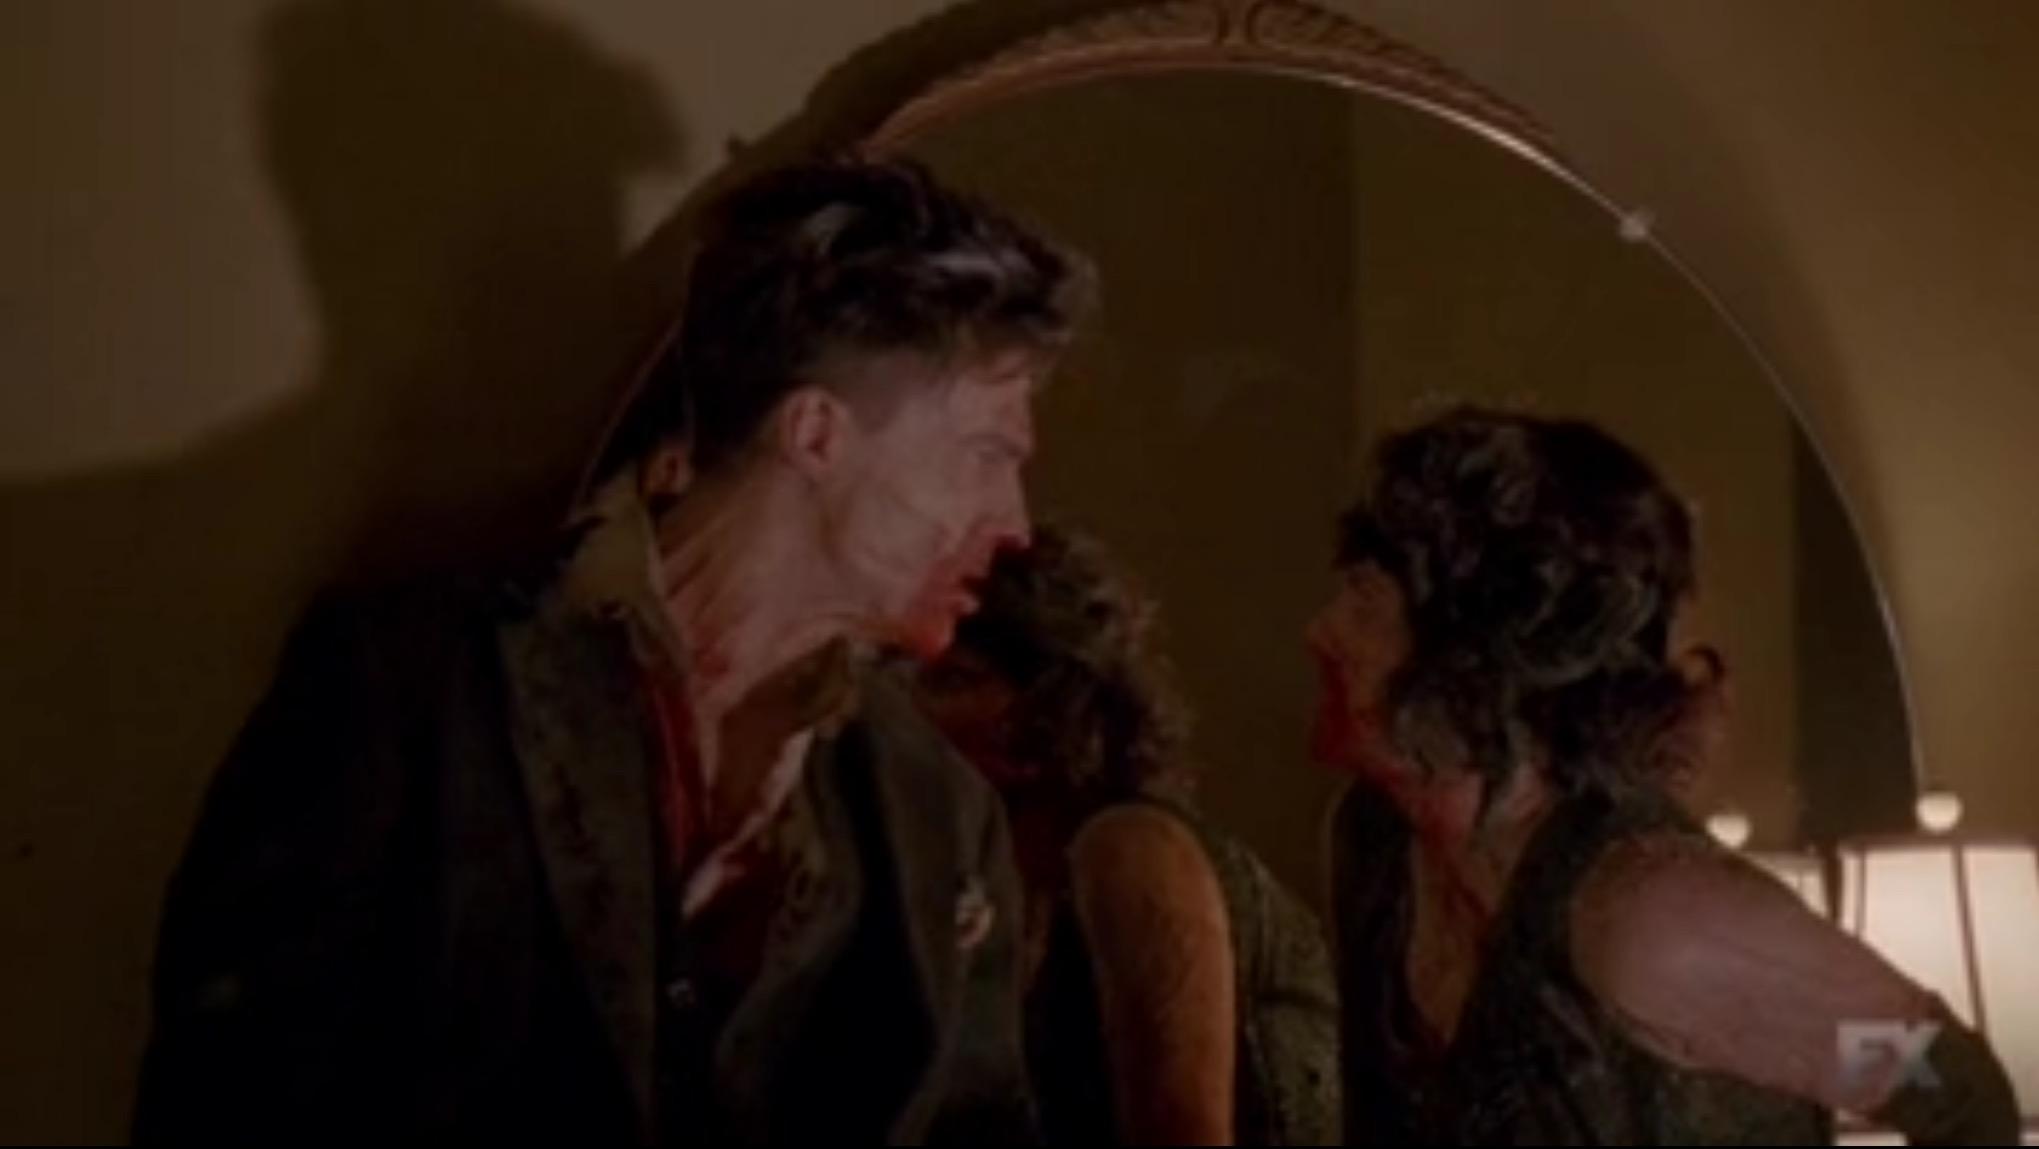 American Horror Story: Hotel Recap: Rudolph Valentino